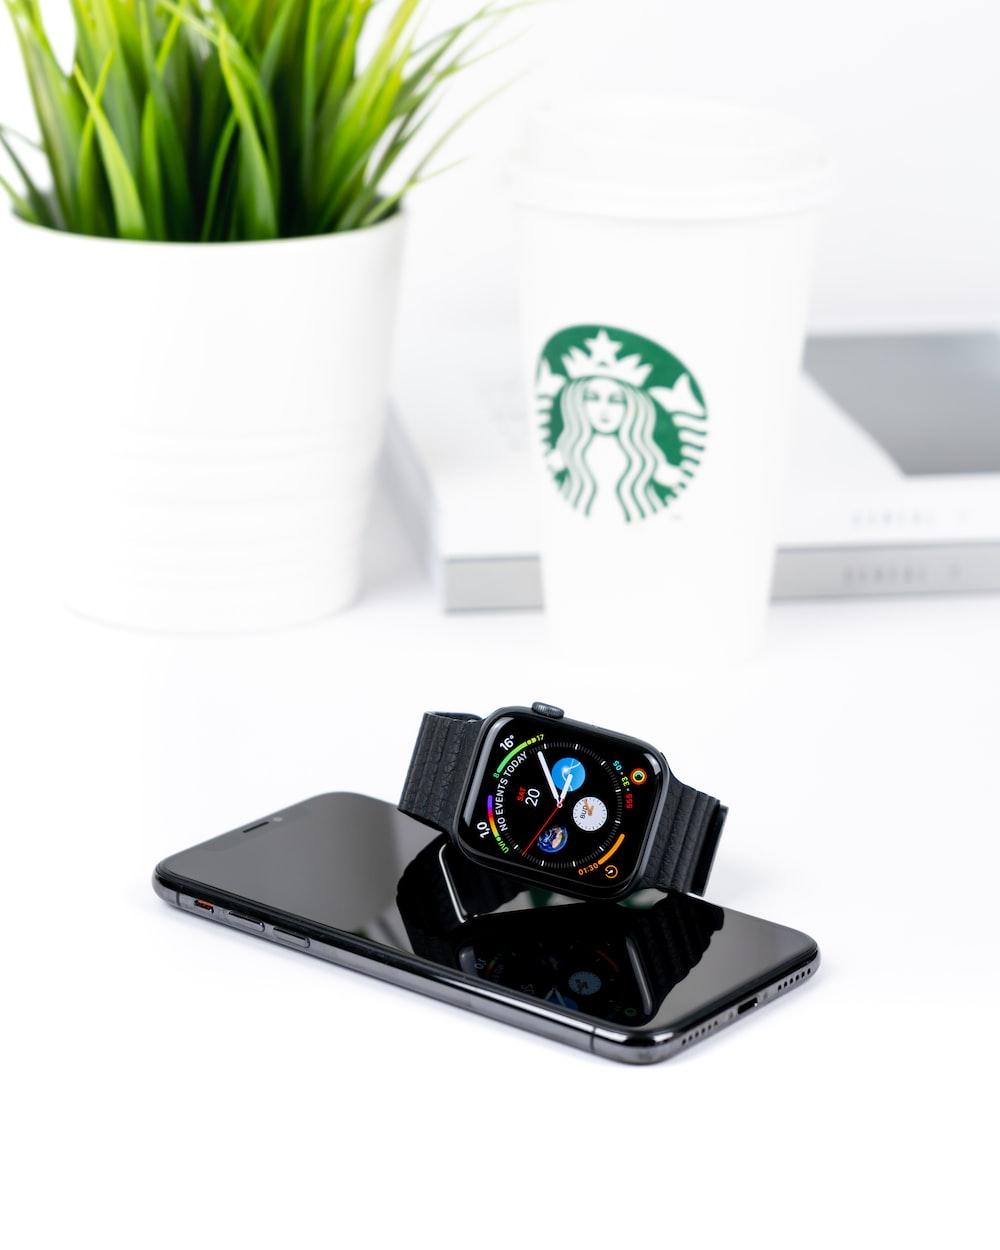 smartwatch on top of smartphone